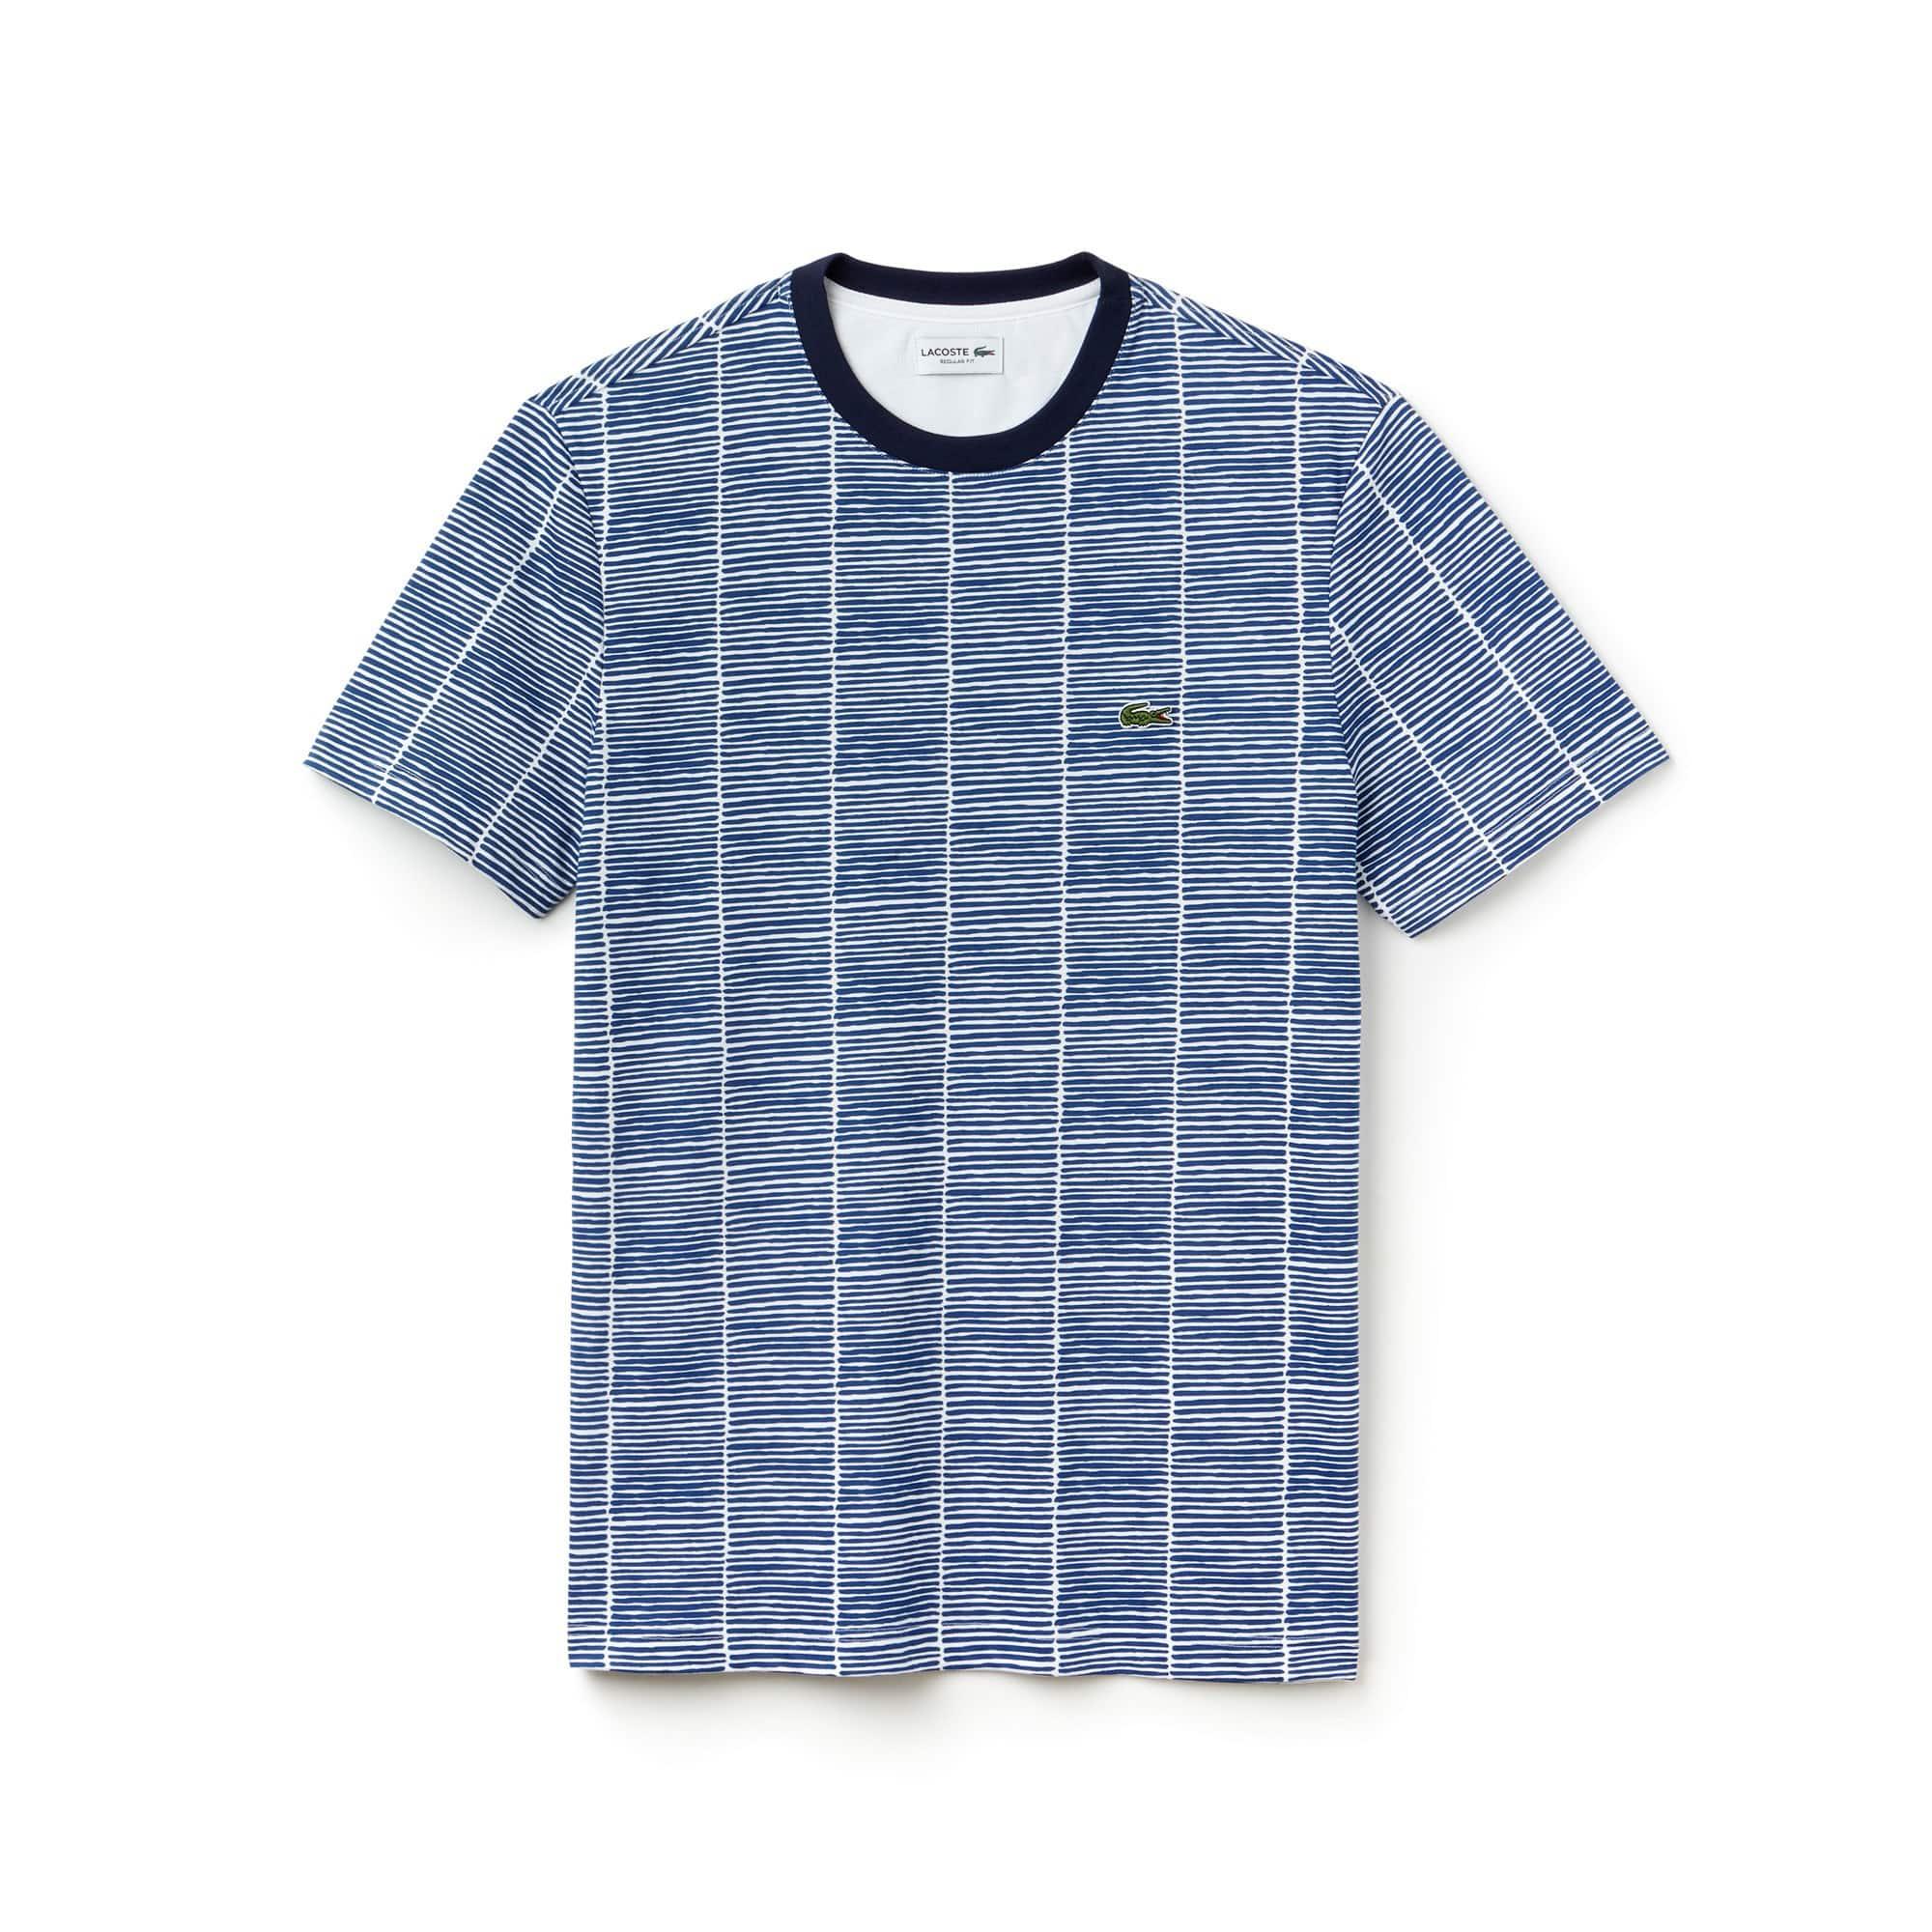 Men's Crew Neck Print Cotton Jersey T-shirt